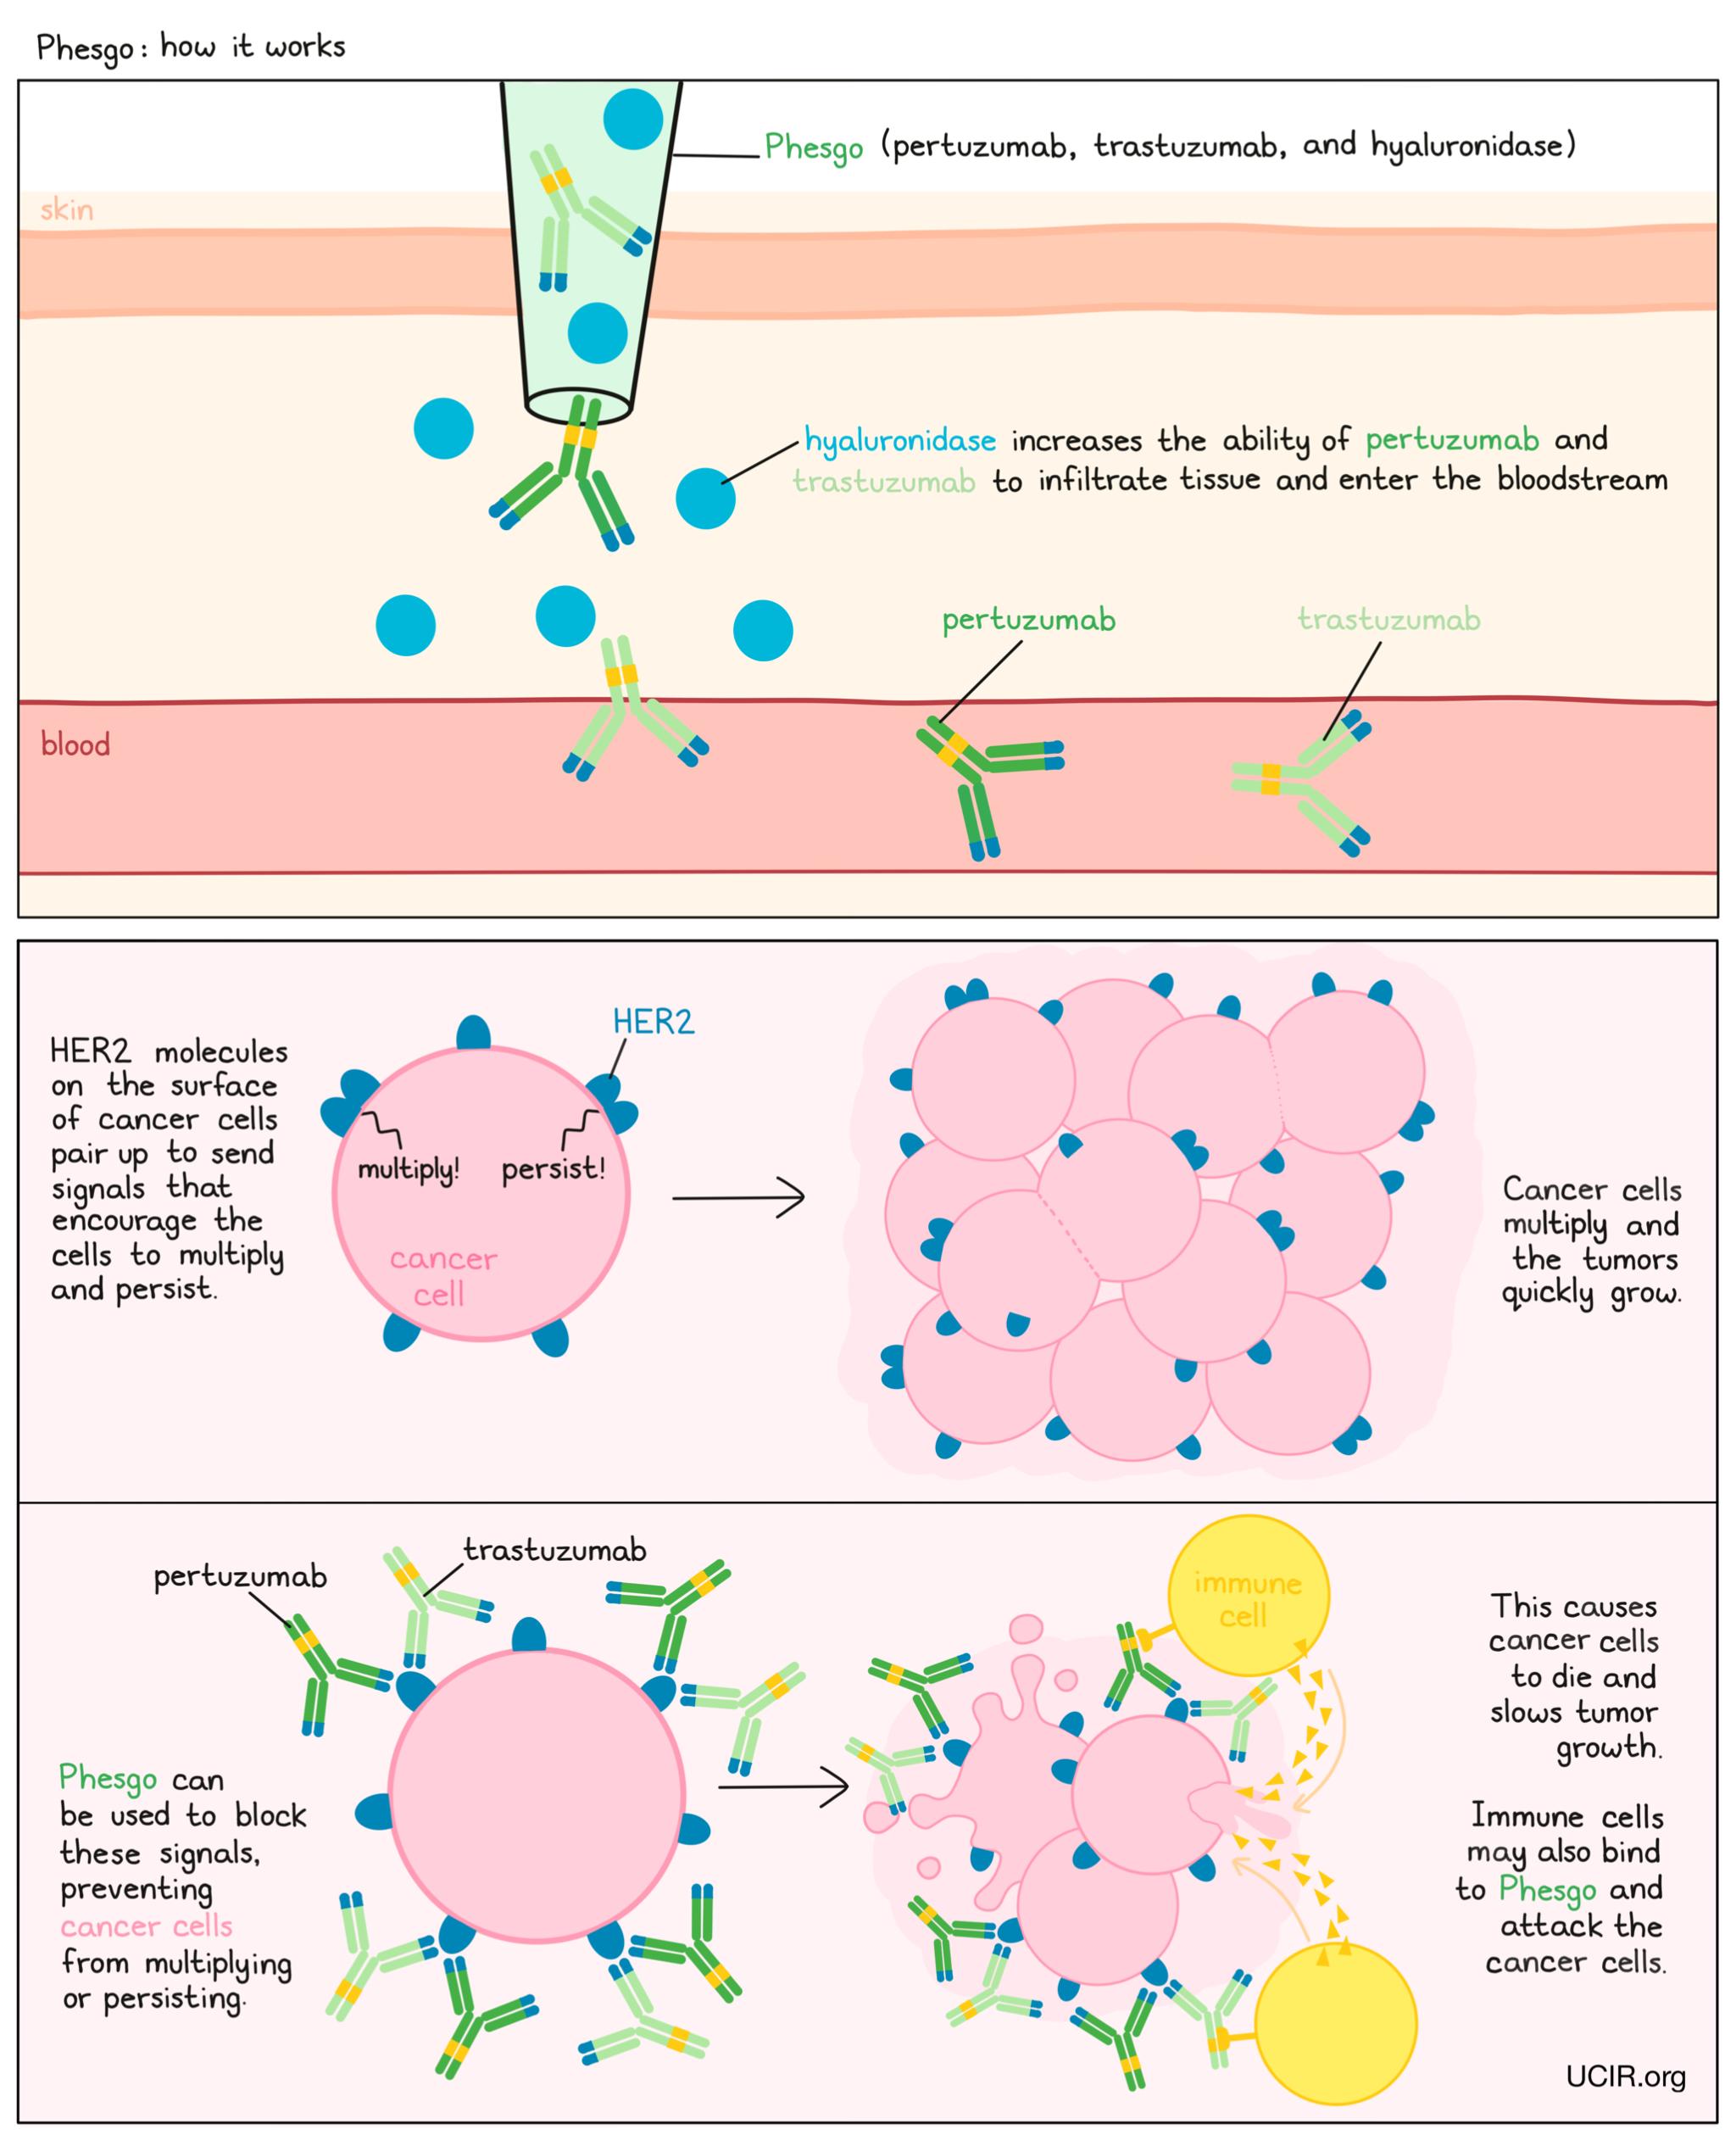 Illustration showing how Phesgo works